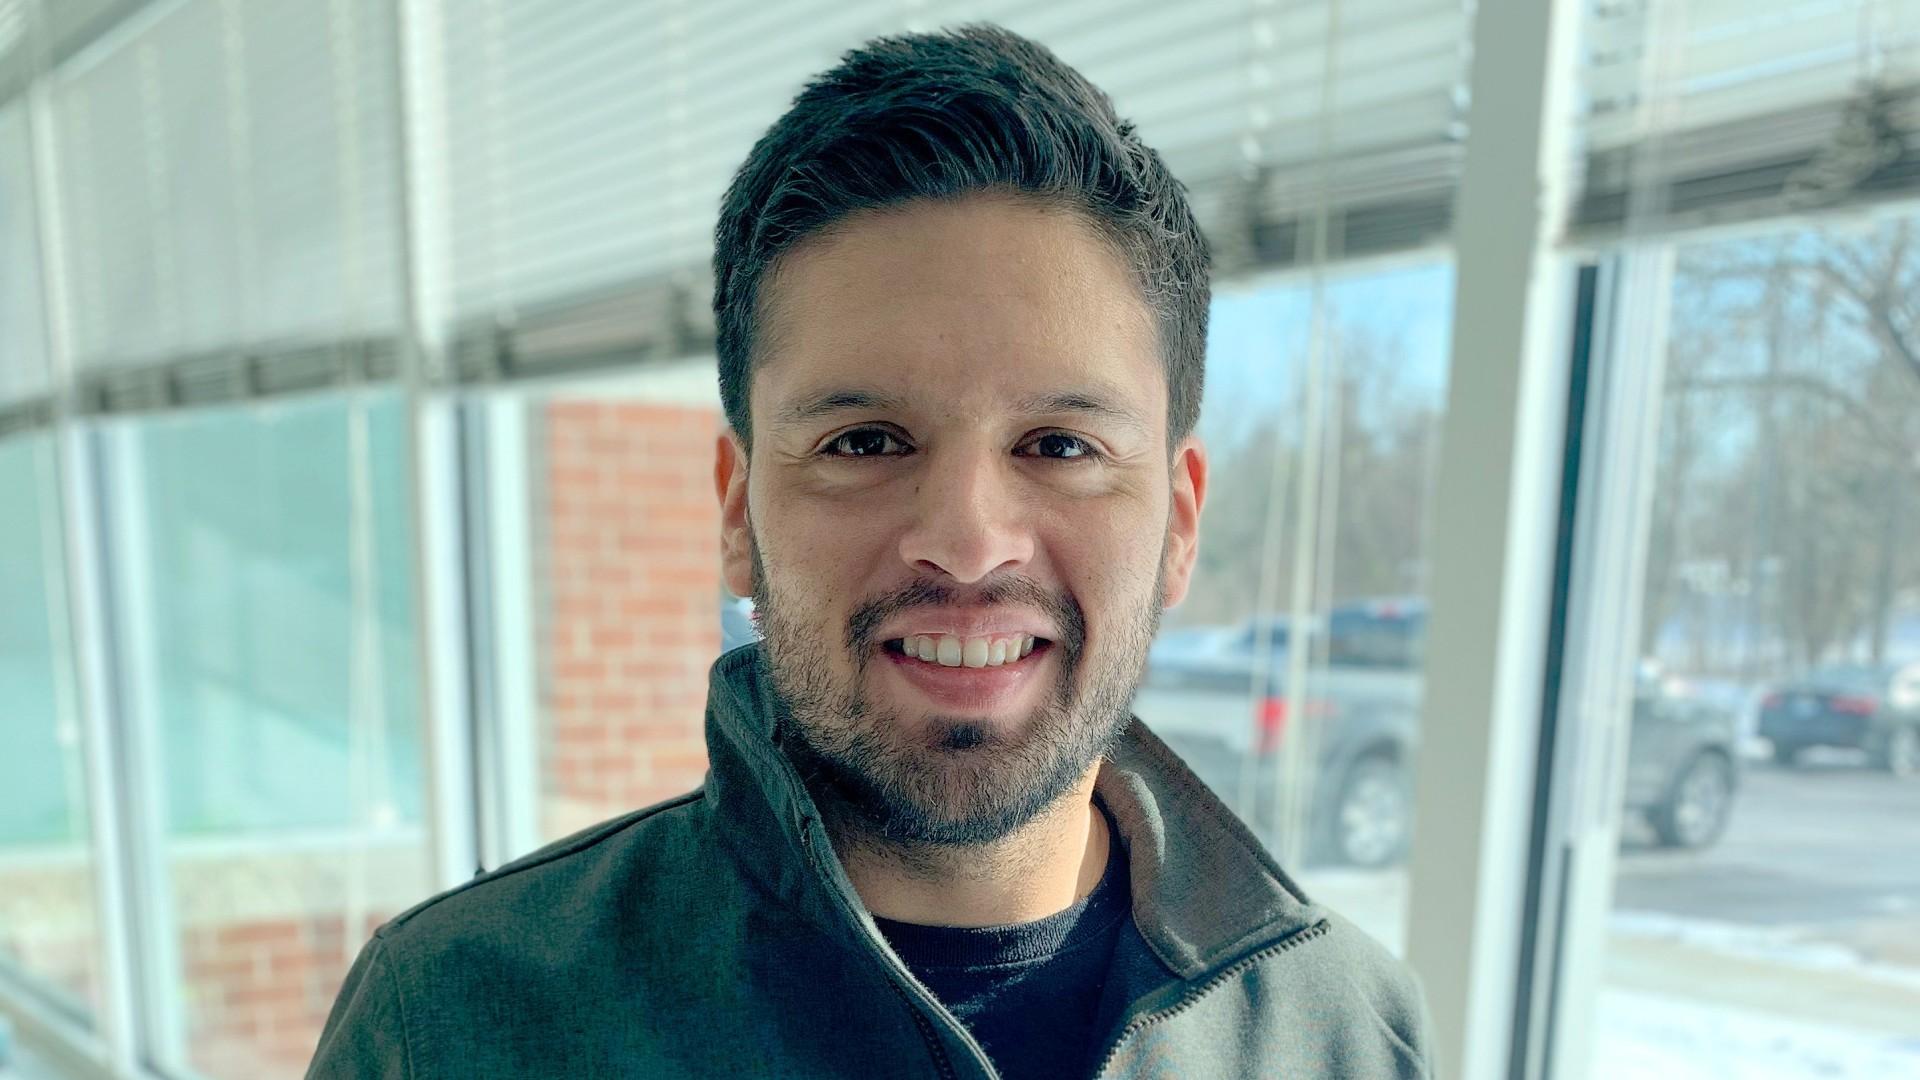 Mauricio, triathlete, working in the customer team at SEG Automotive